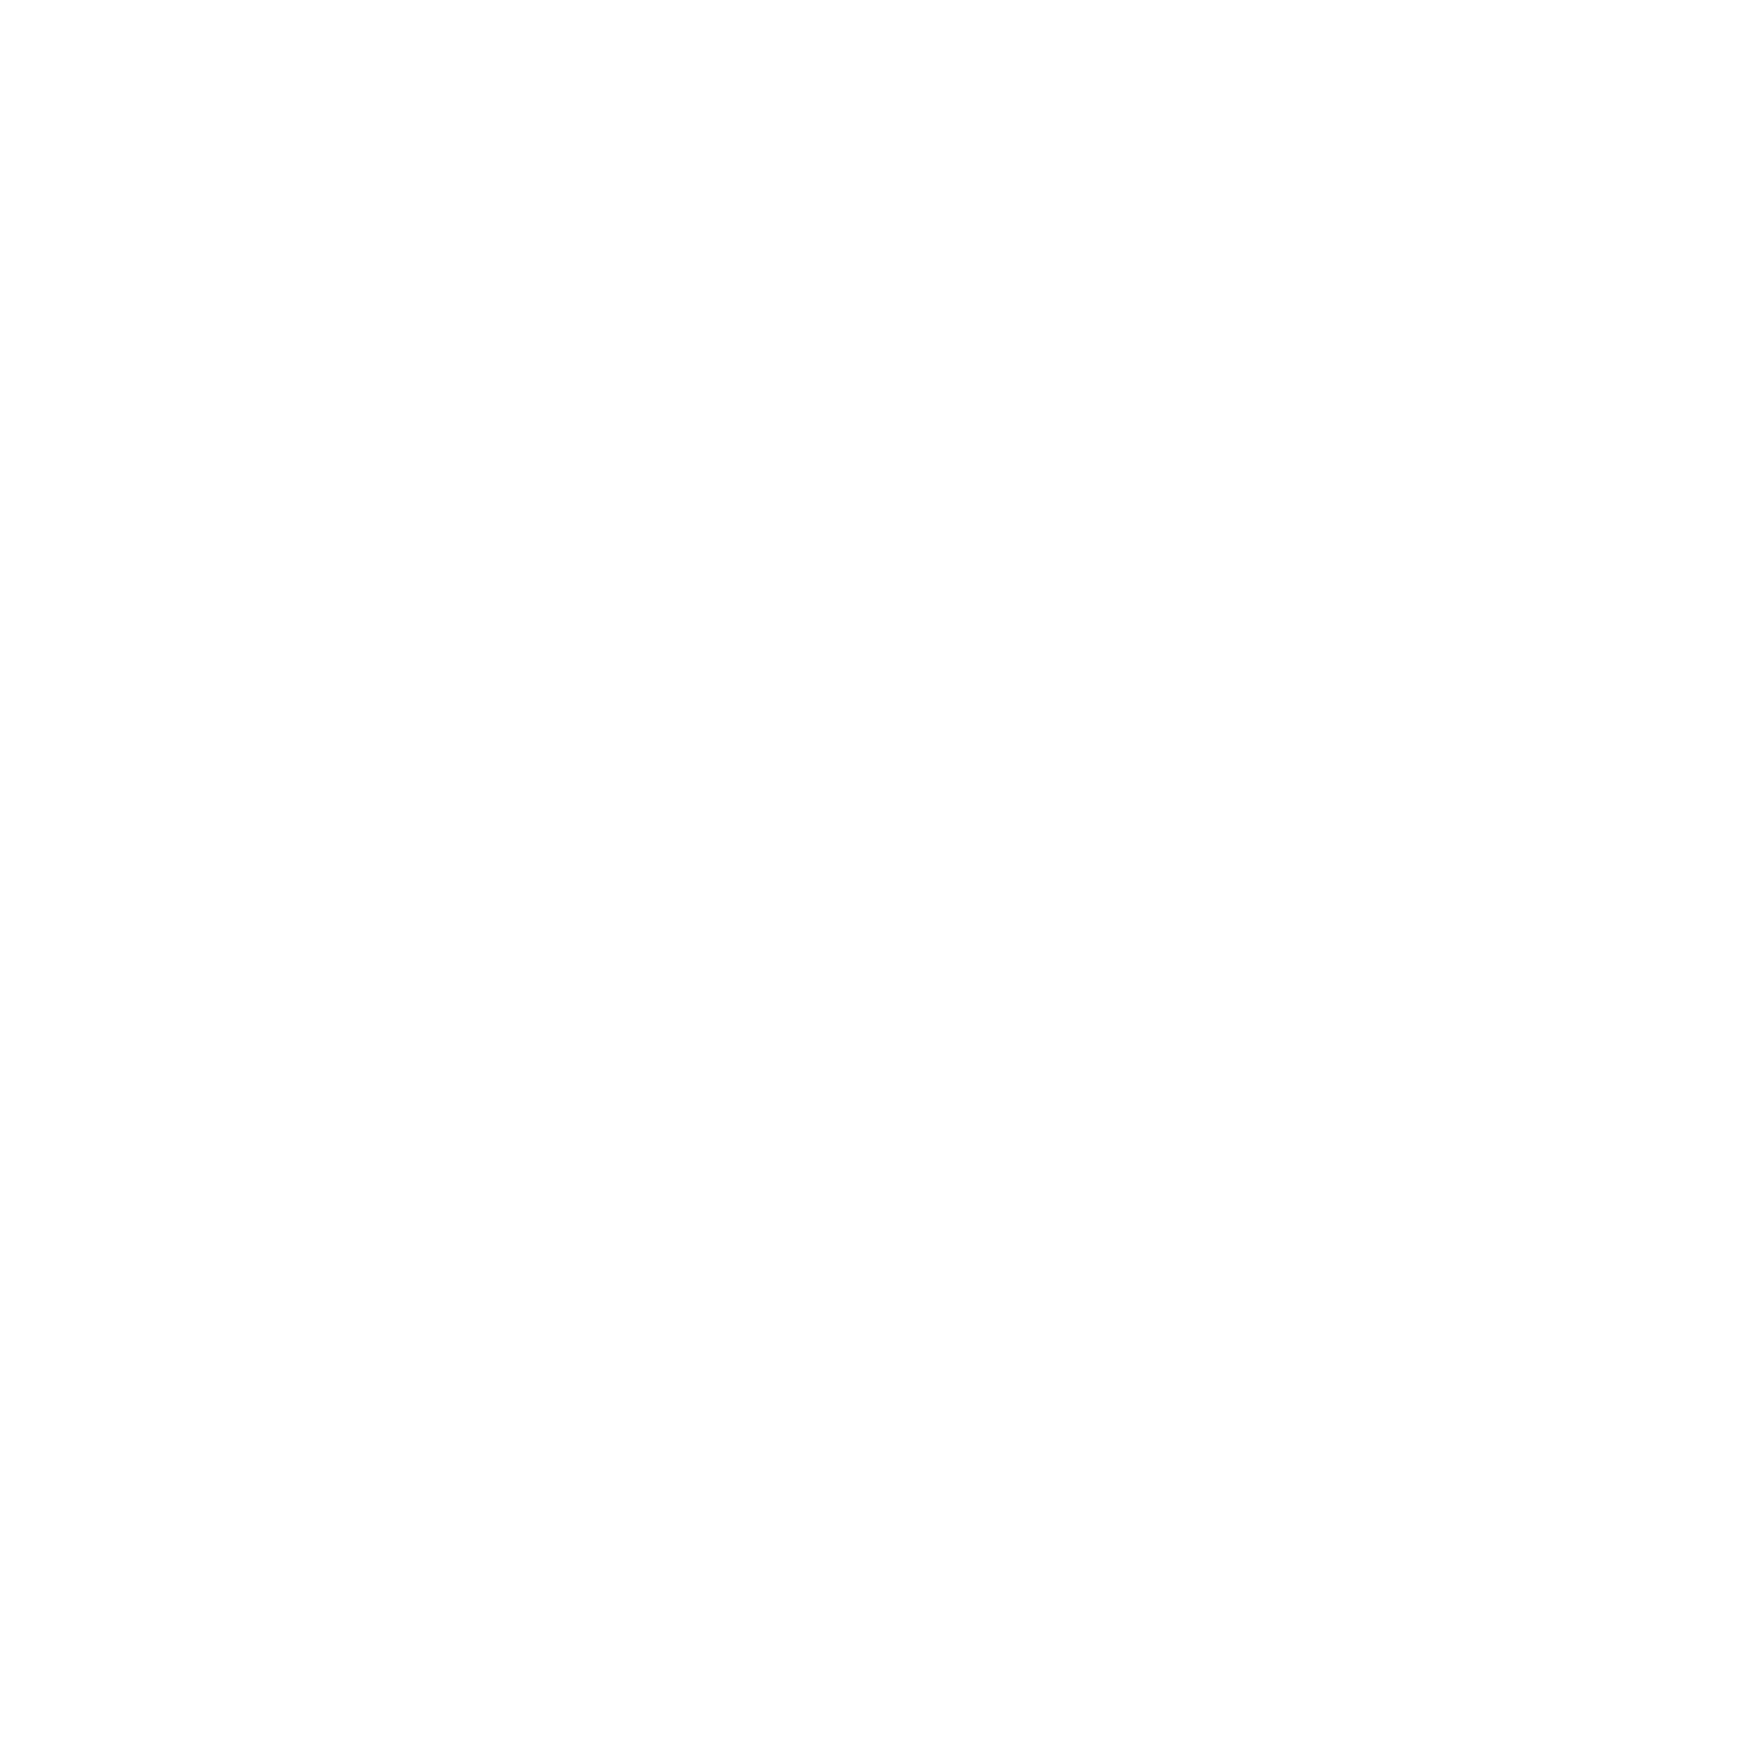 reding symbol